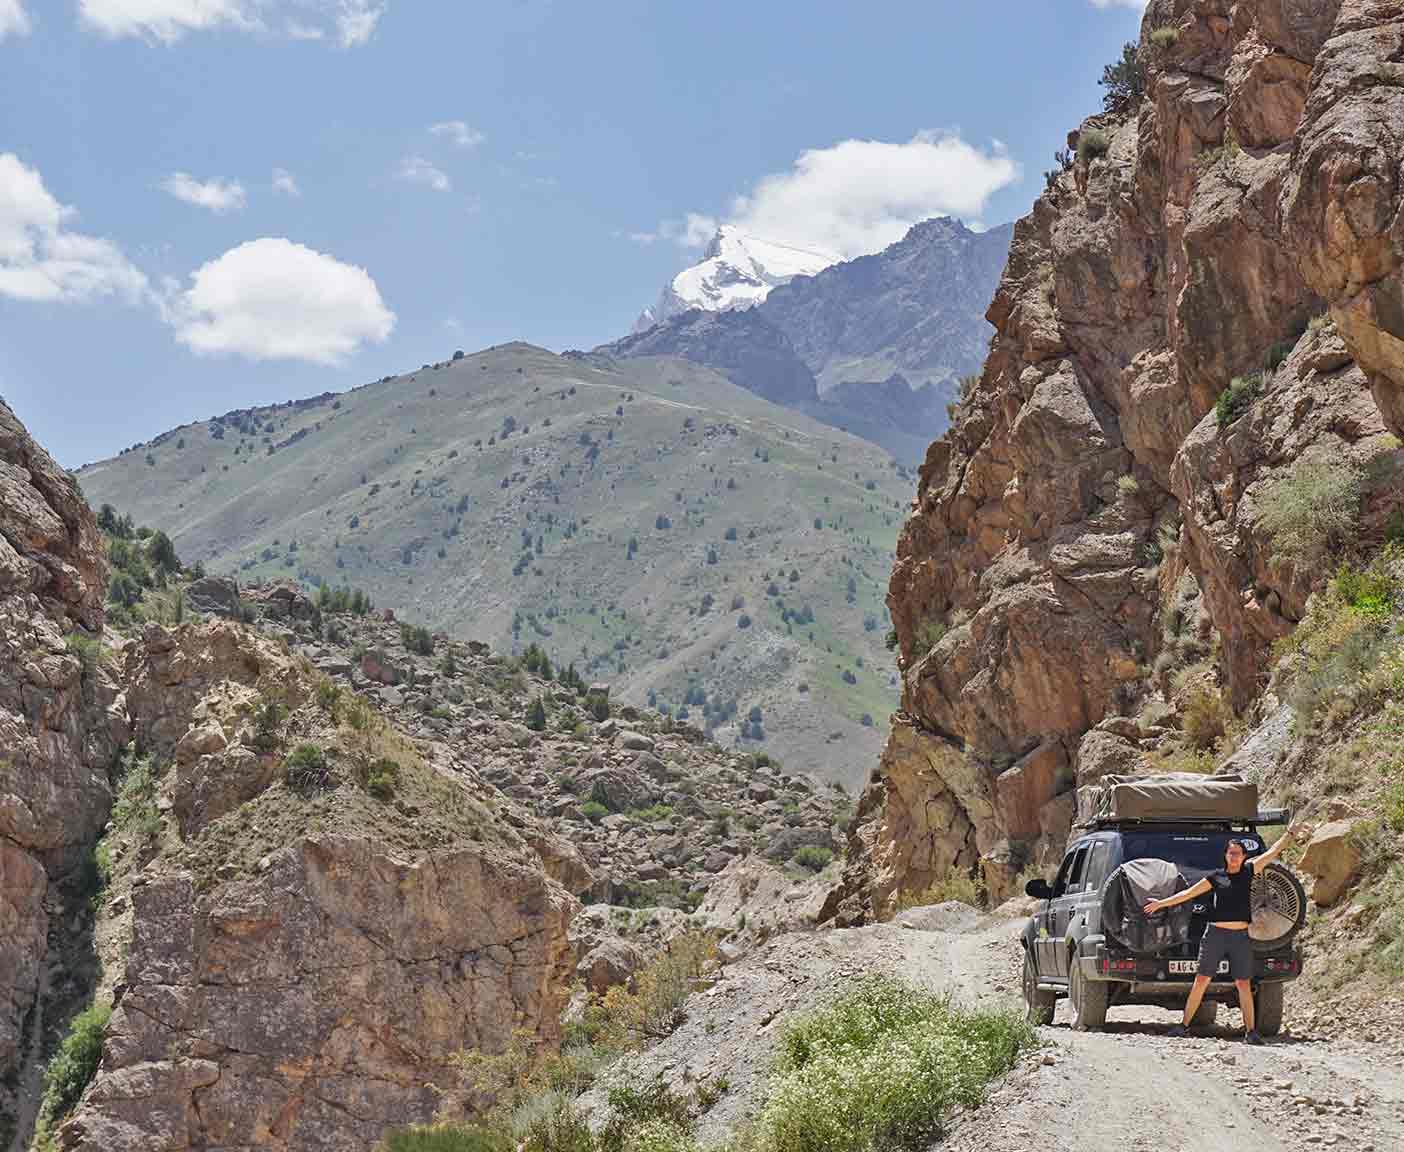 weltreise-hyundai-terracan-fernreisemobil-expedition